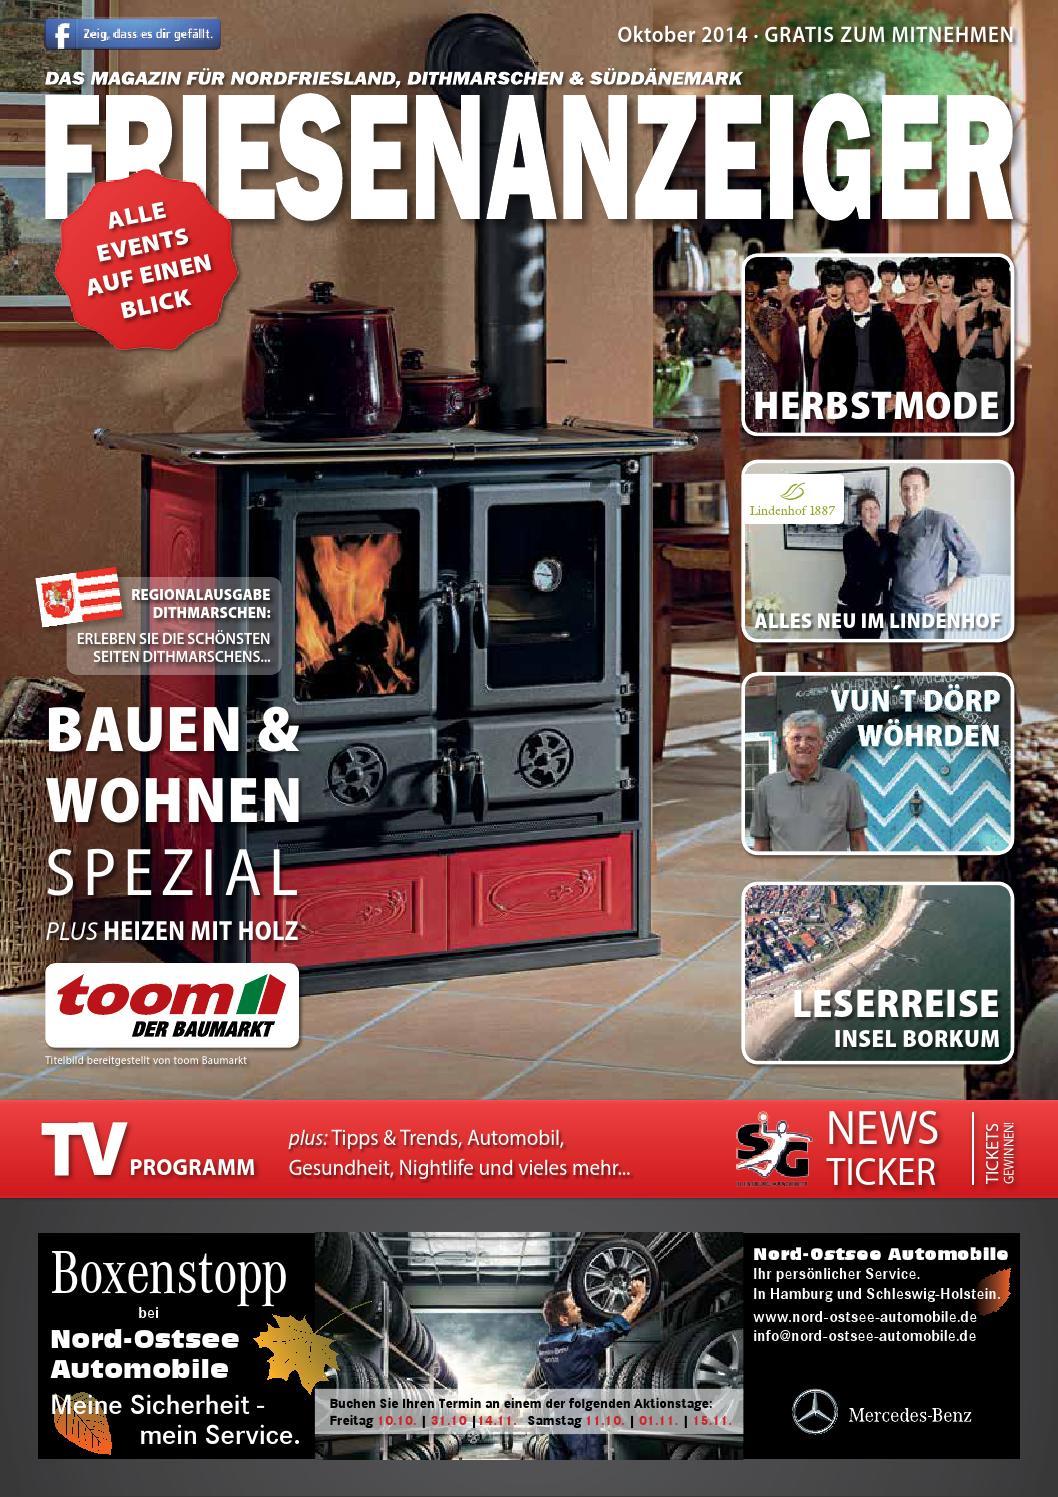 Friesenanzeiger dezember 2014 by new media works   issuu